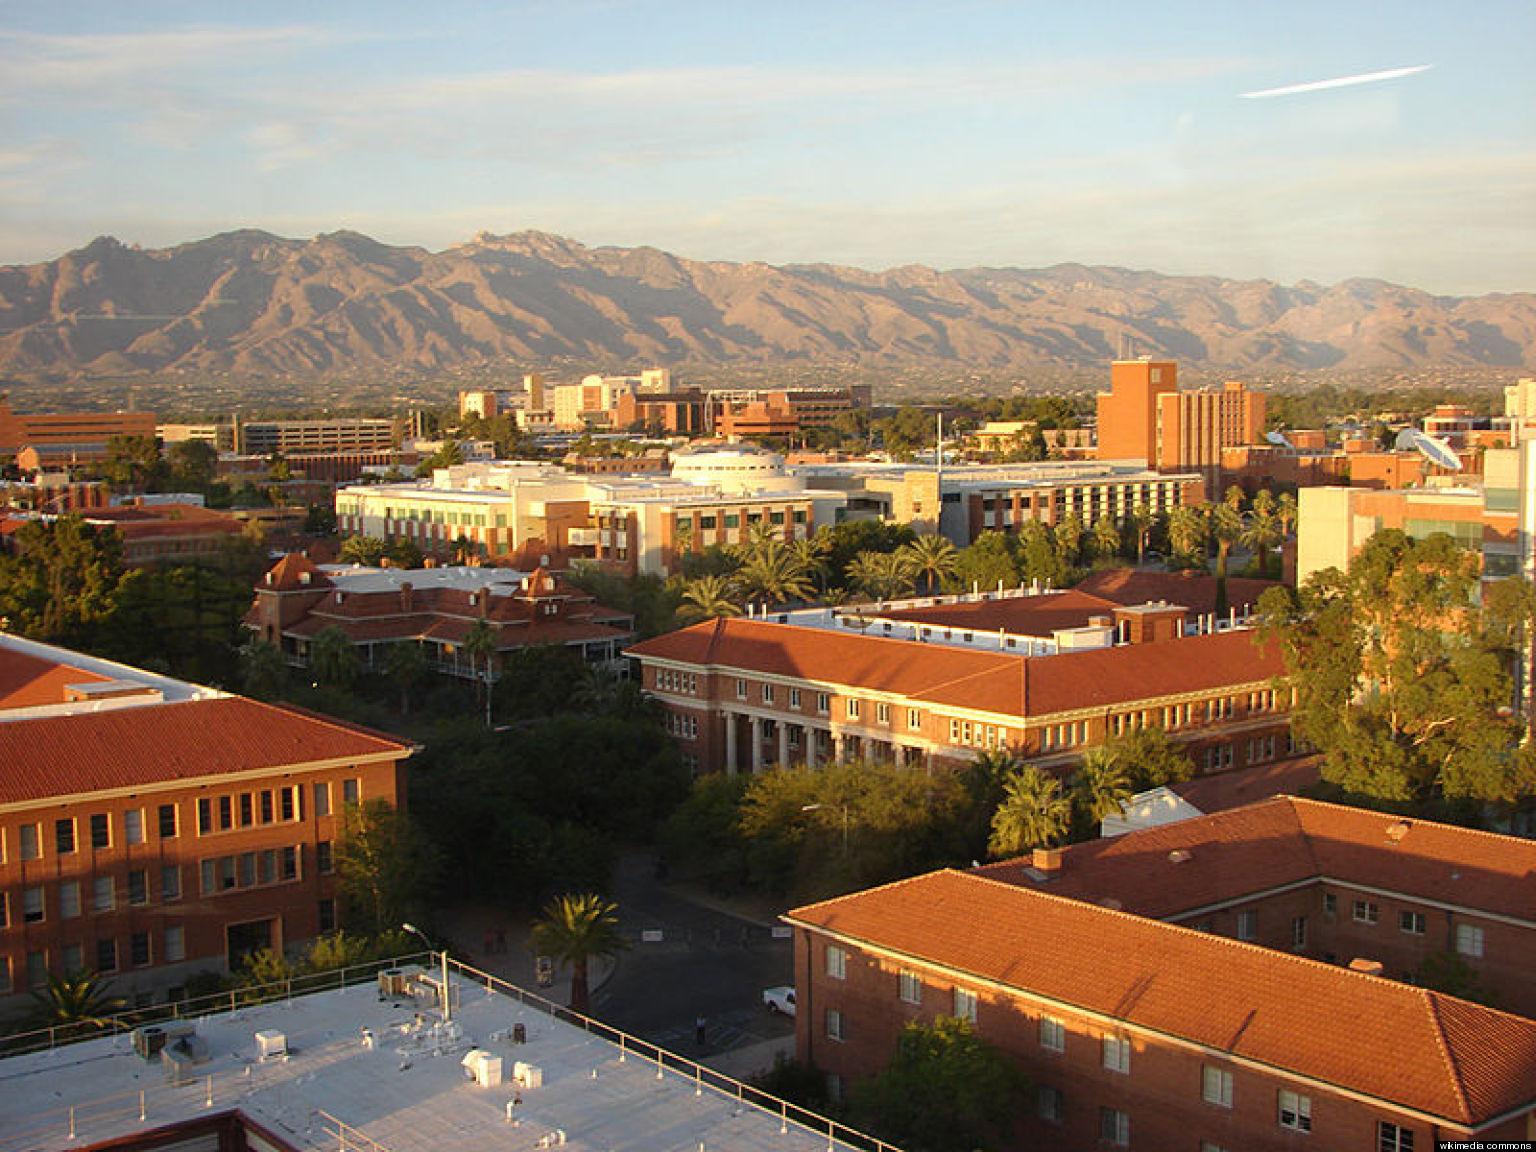 colleges university arizona whats dating scene like